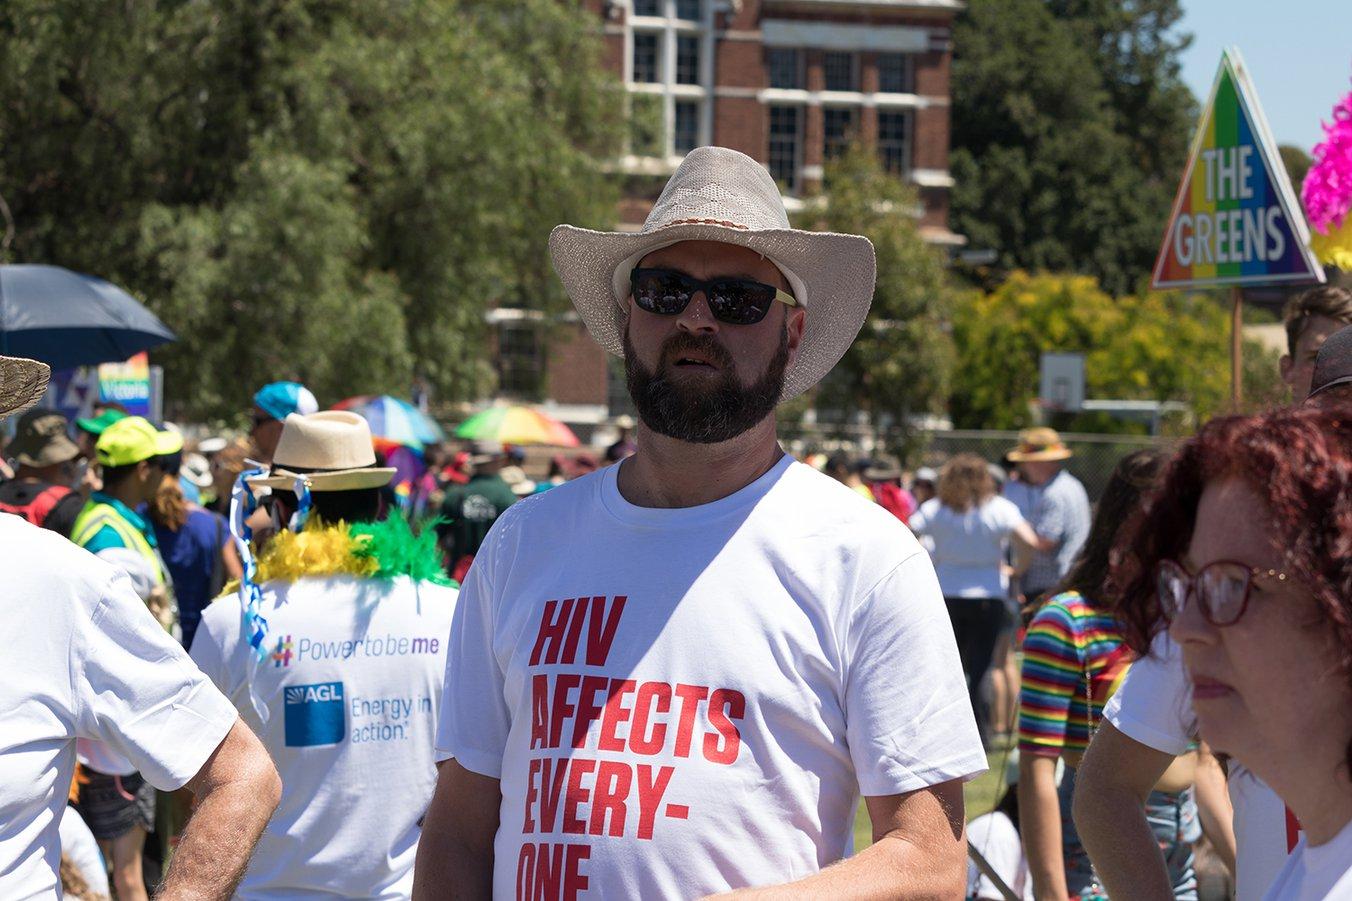 20170202_Pride March_Paul Rees_RE-SIZED_004.jpg